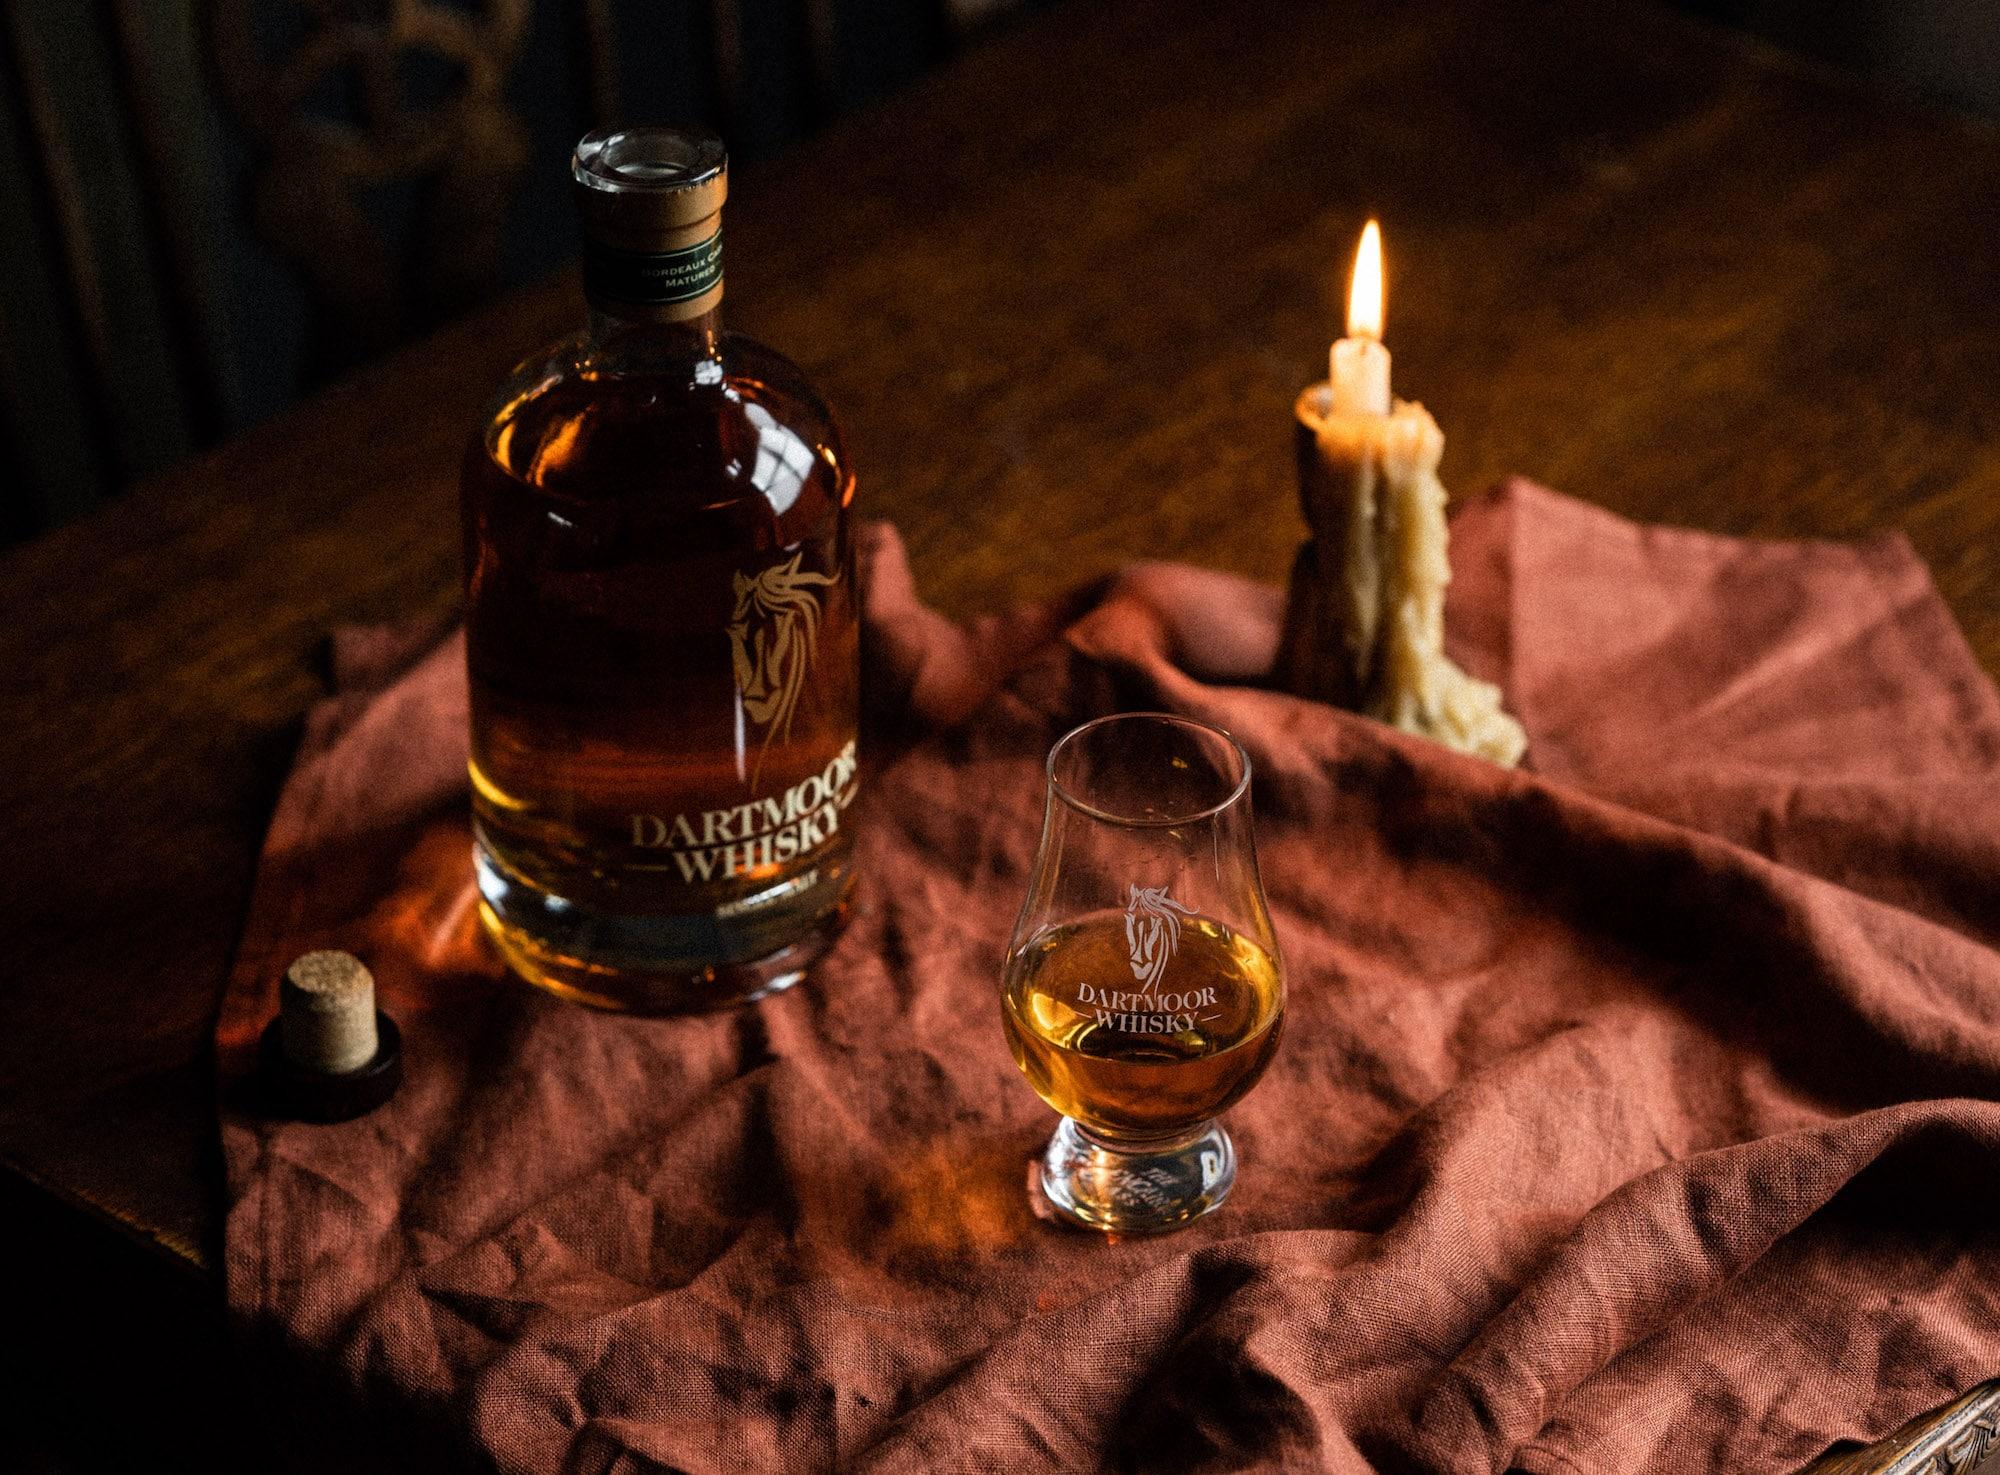 Dartmoor Whisky Good Things Take time